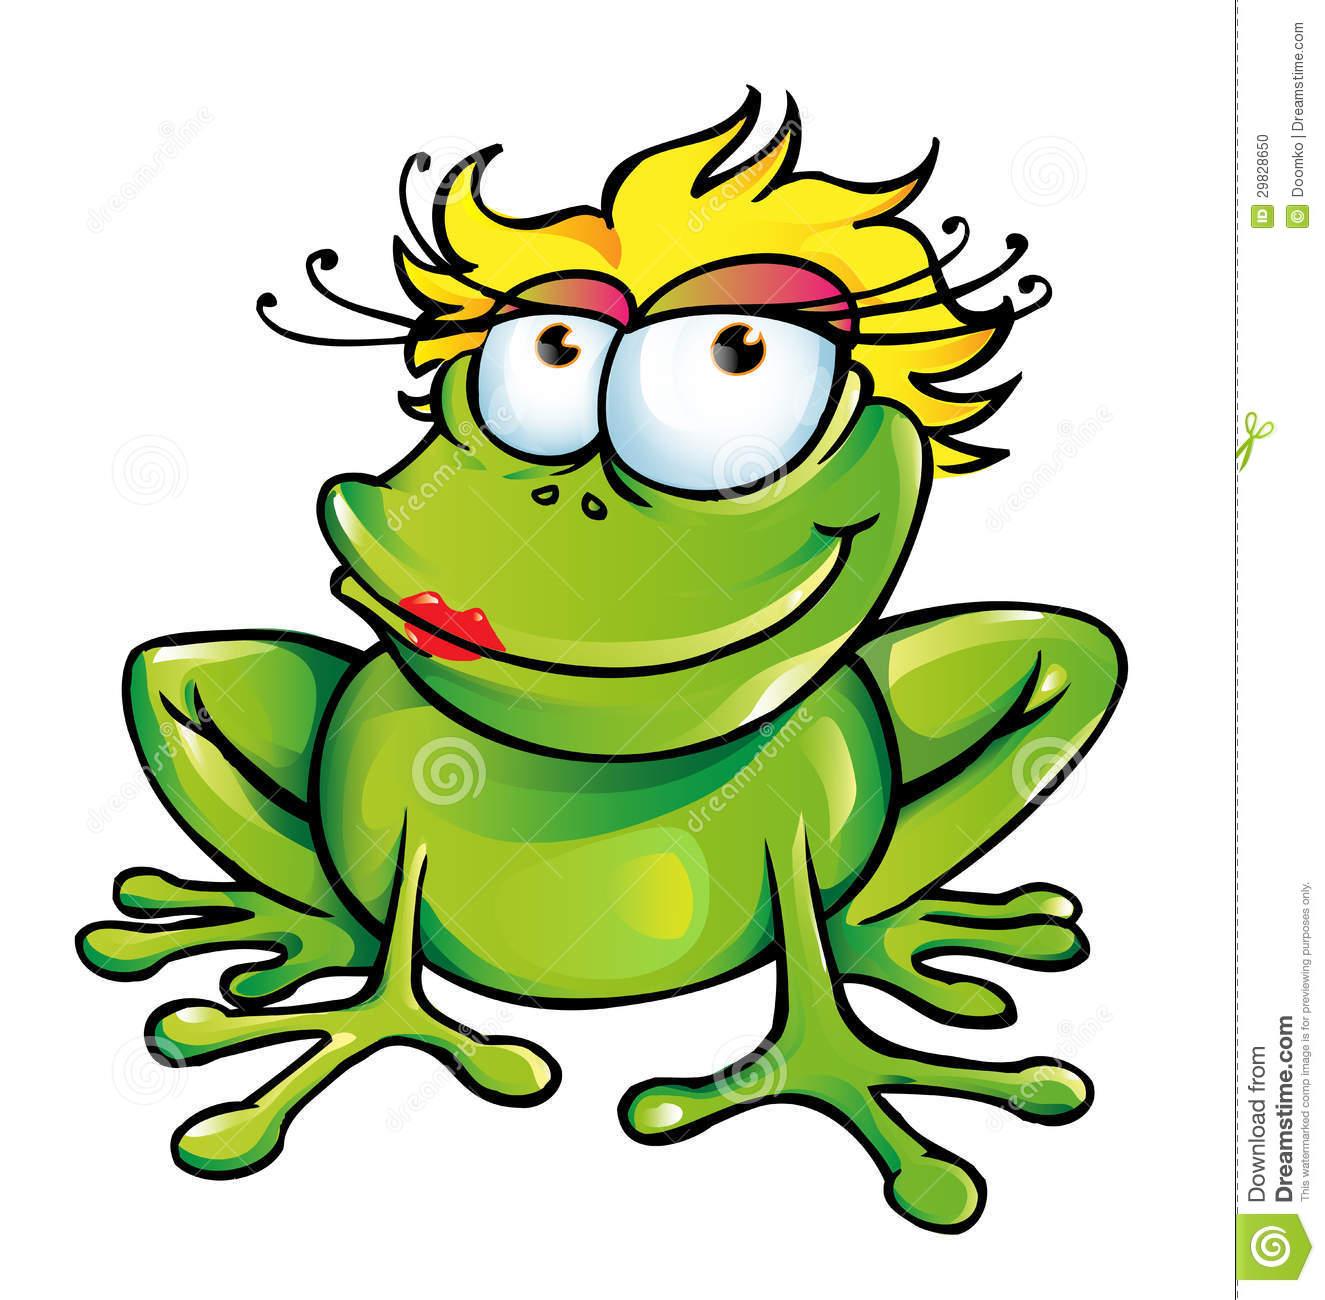 cartoon frog wallpaper 1325x1300